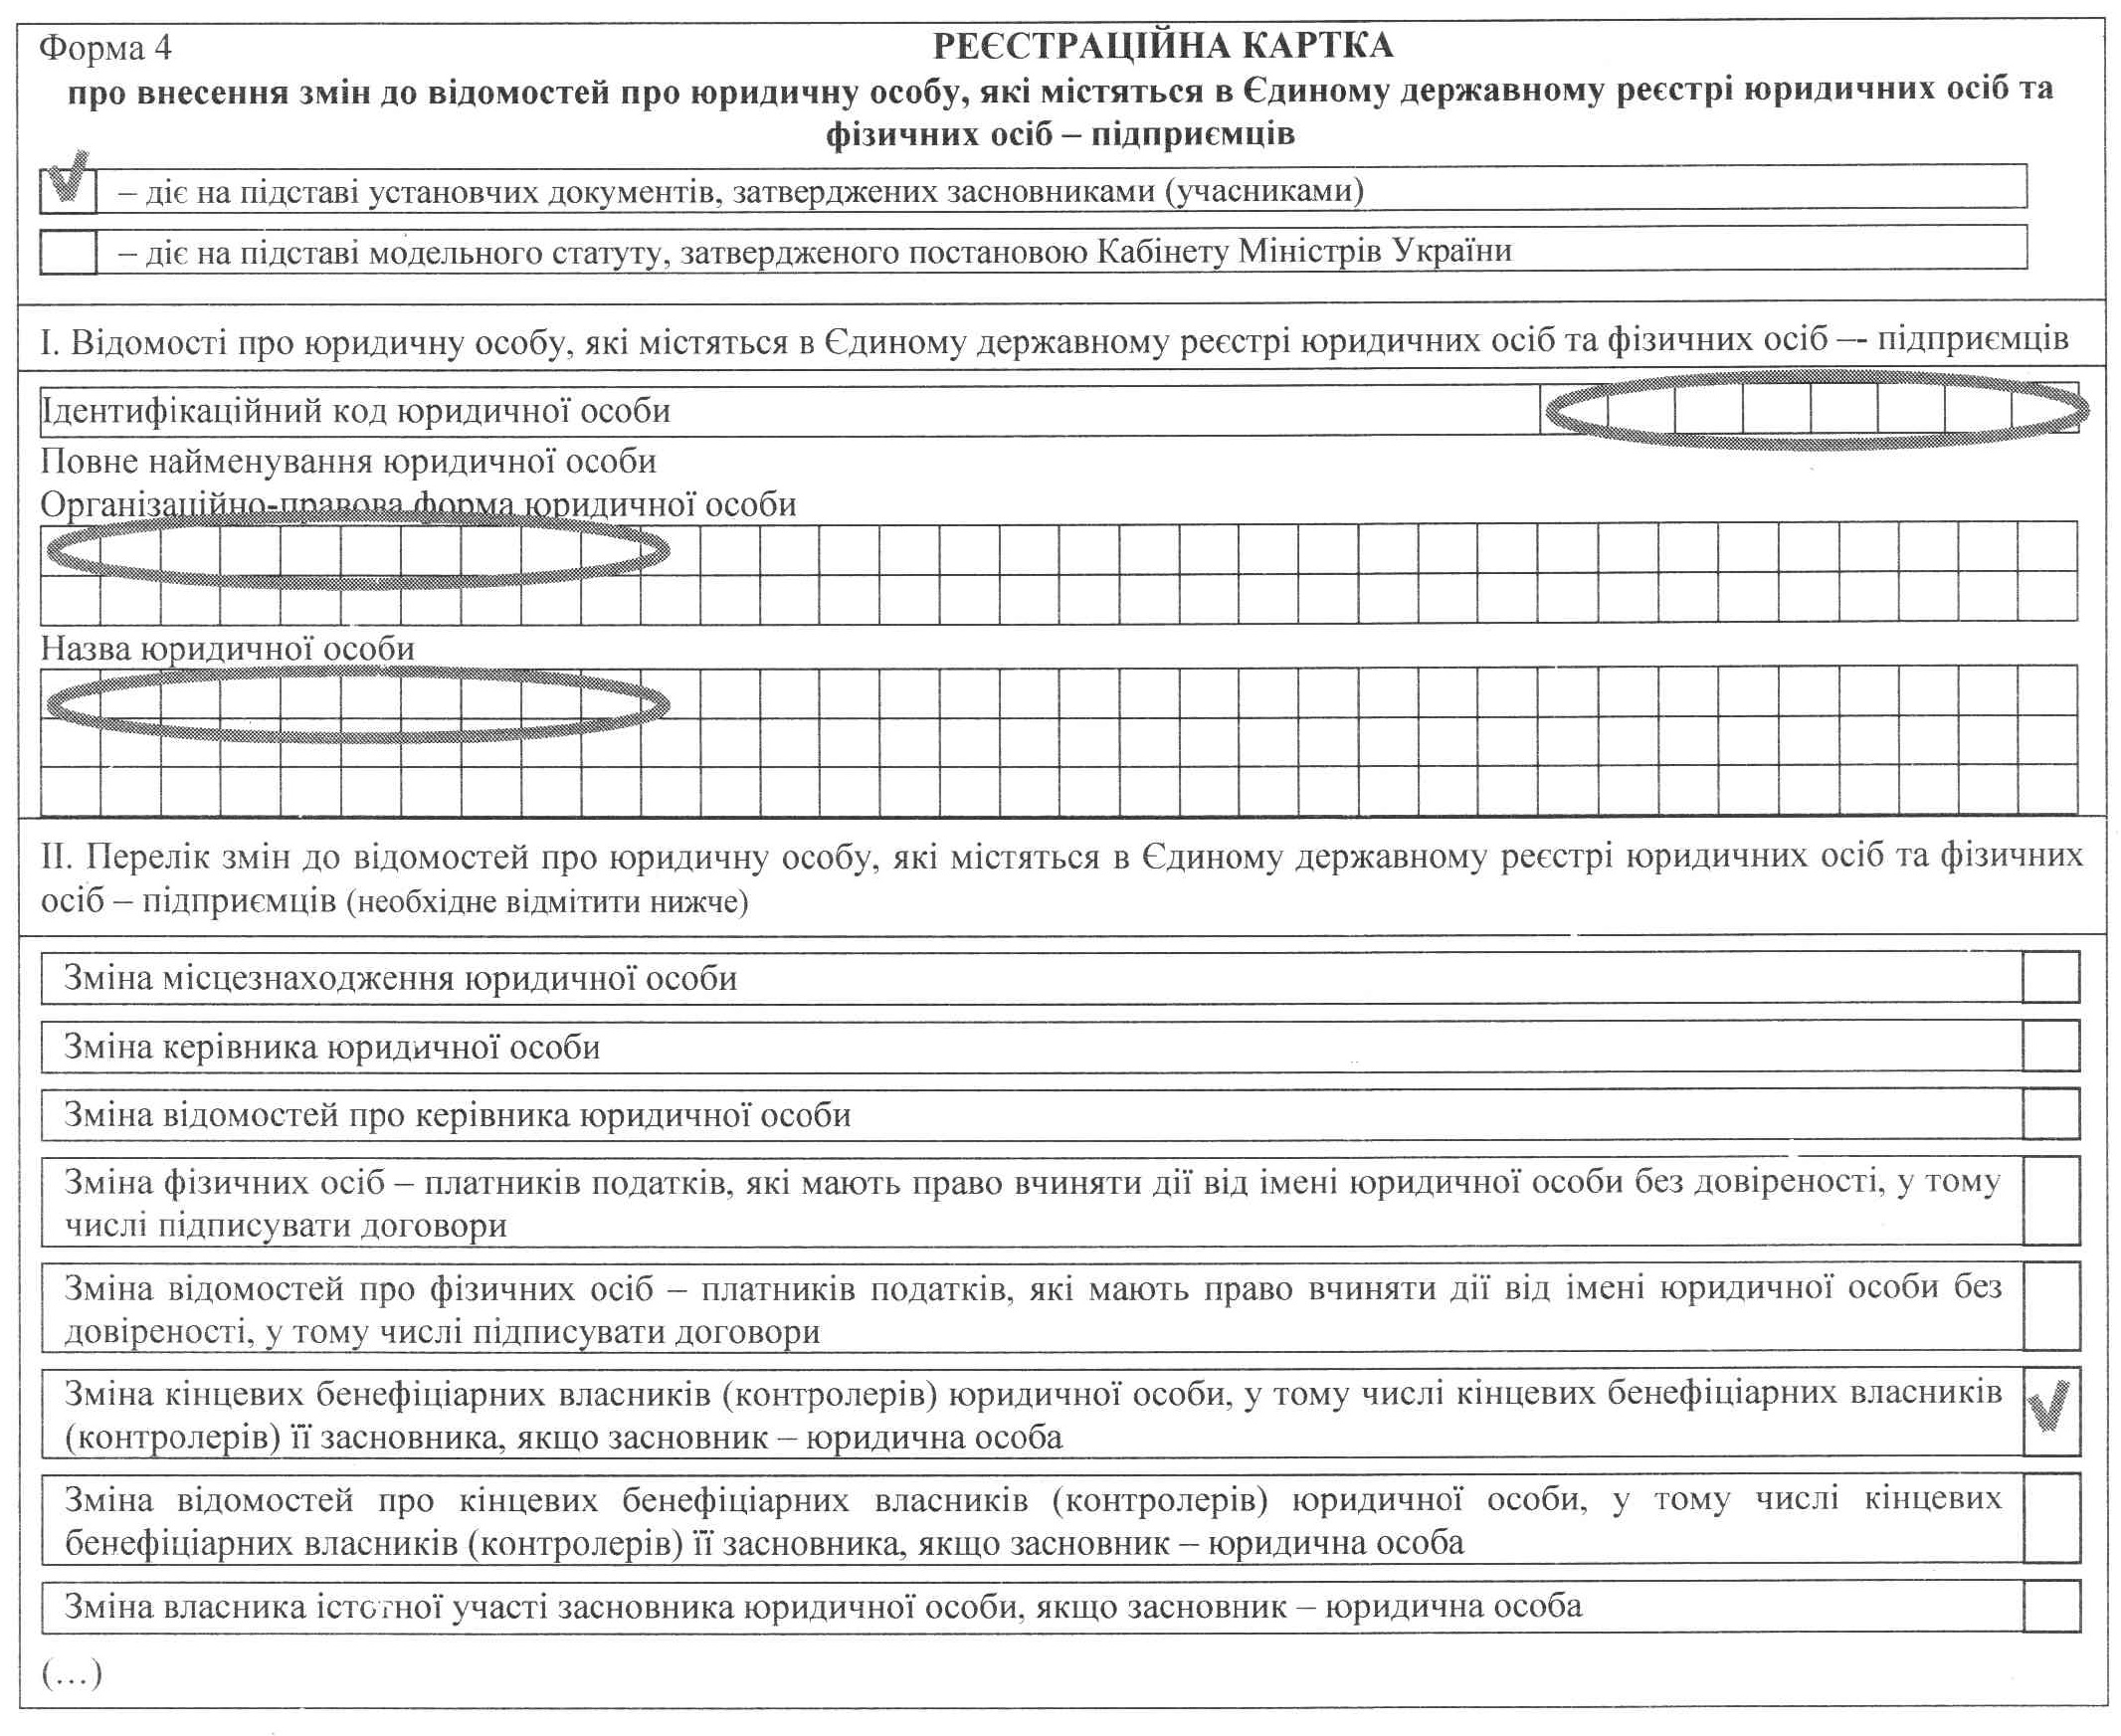 образец карточки прописки форма 16